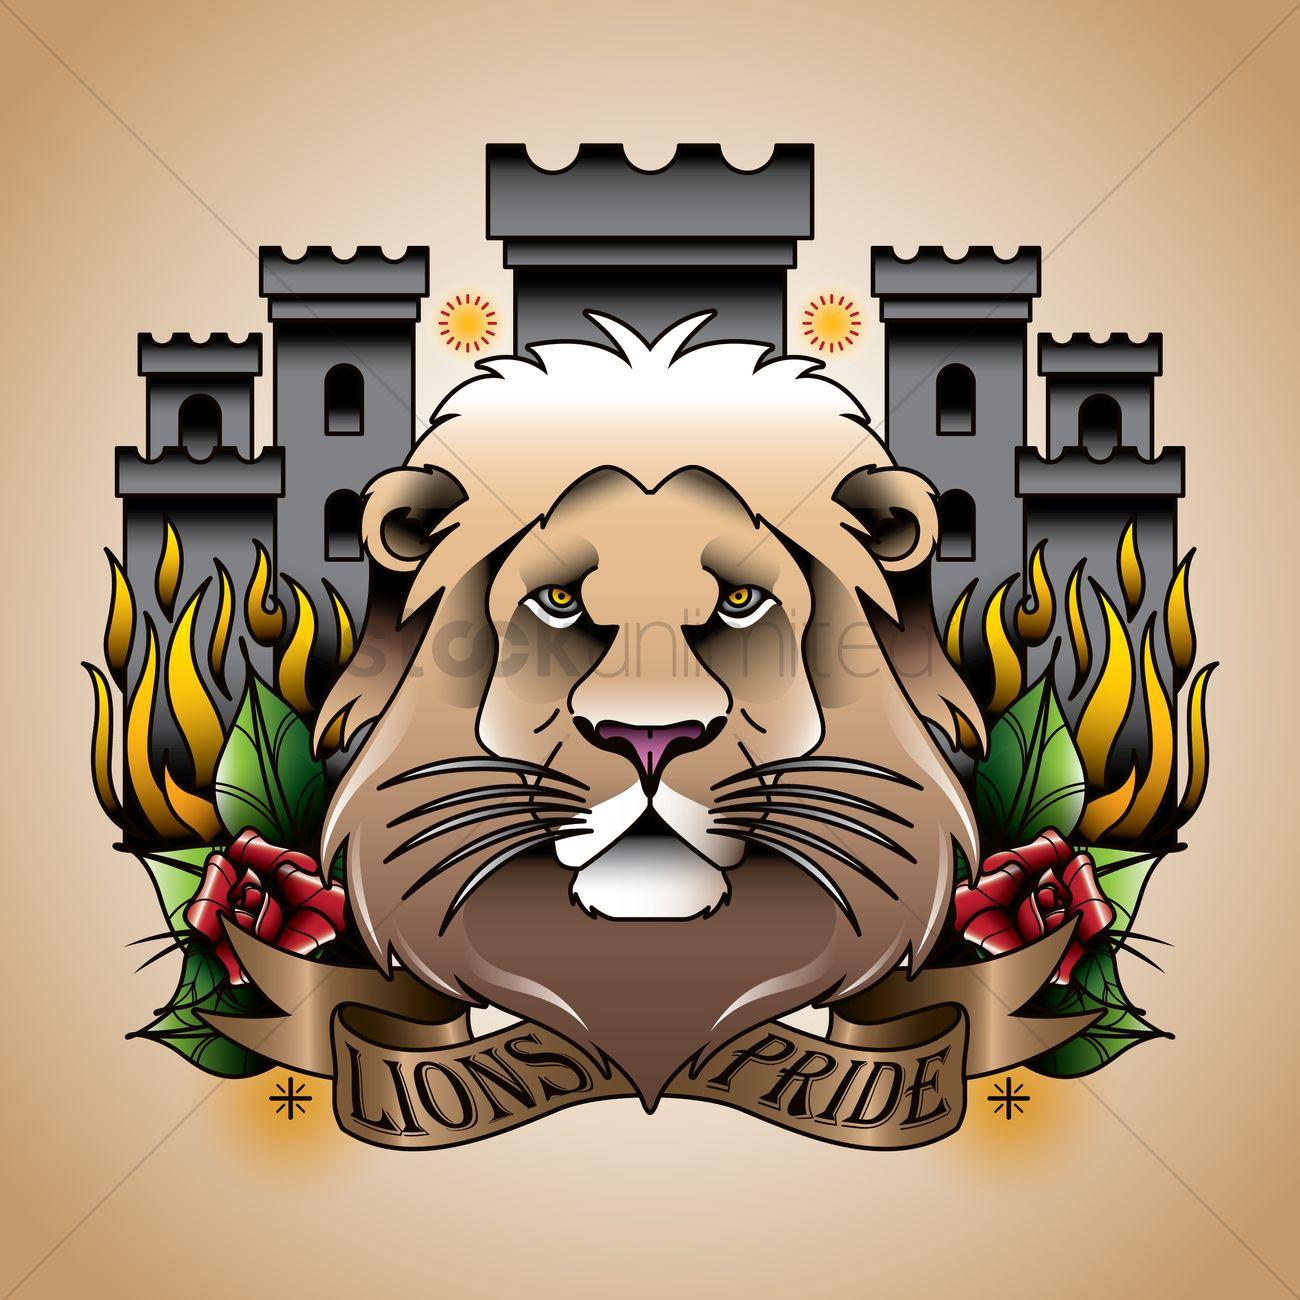 Castle design with lion pride text Vector Image.